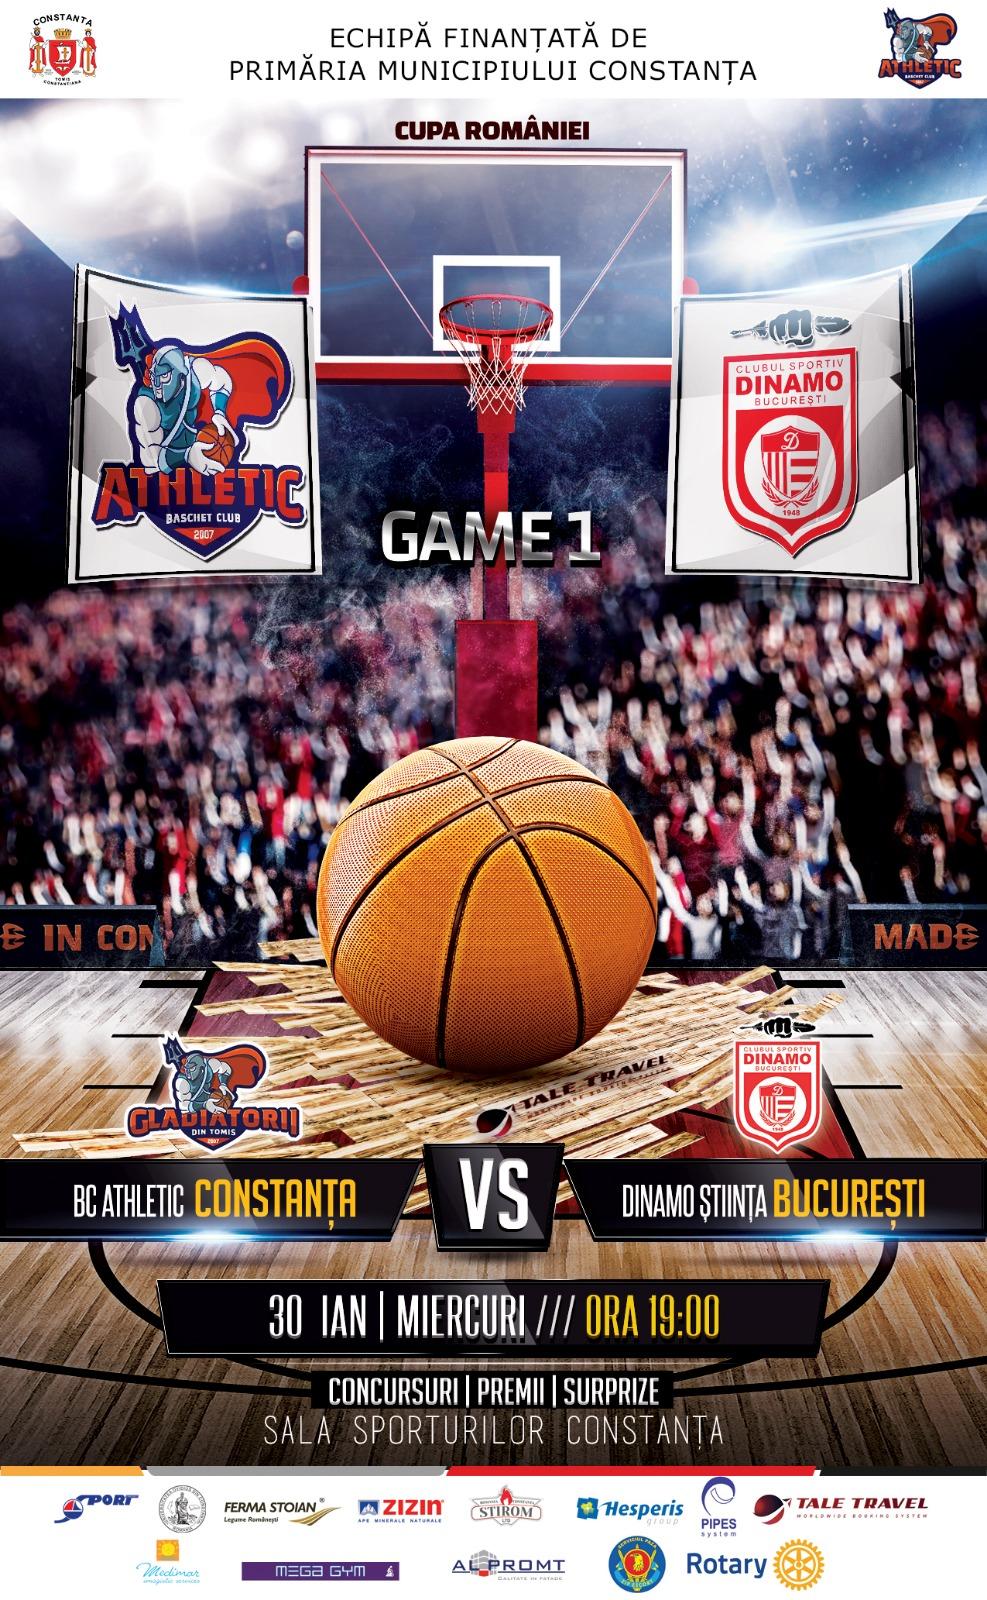 afis BC Athletic Constanta vs Dinamo Stiinta Bucuresti 30.01.2019